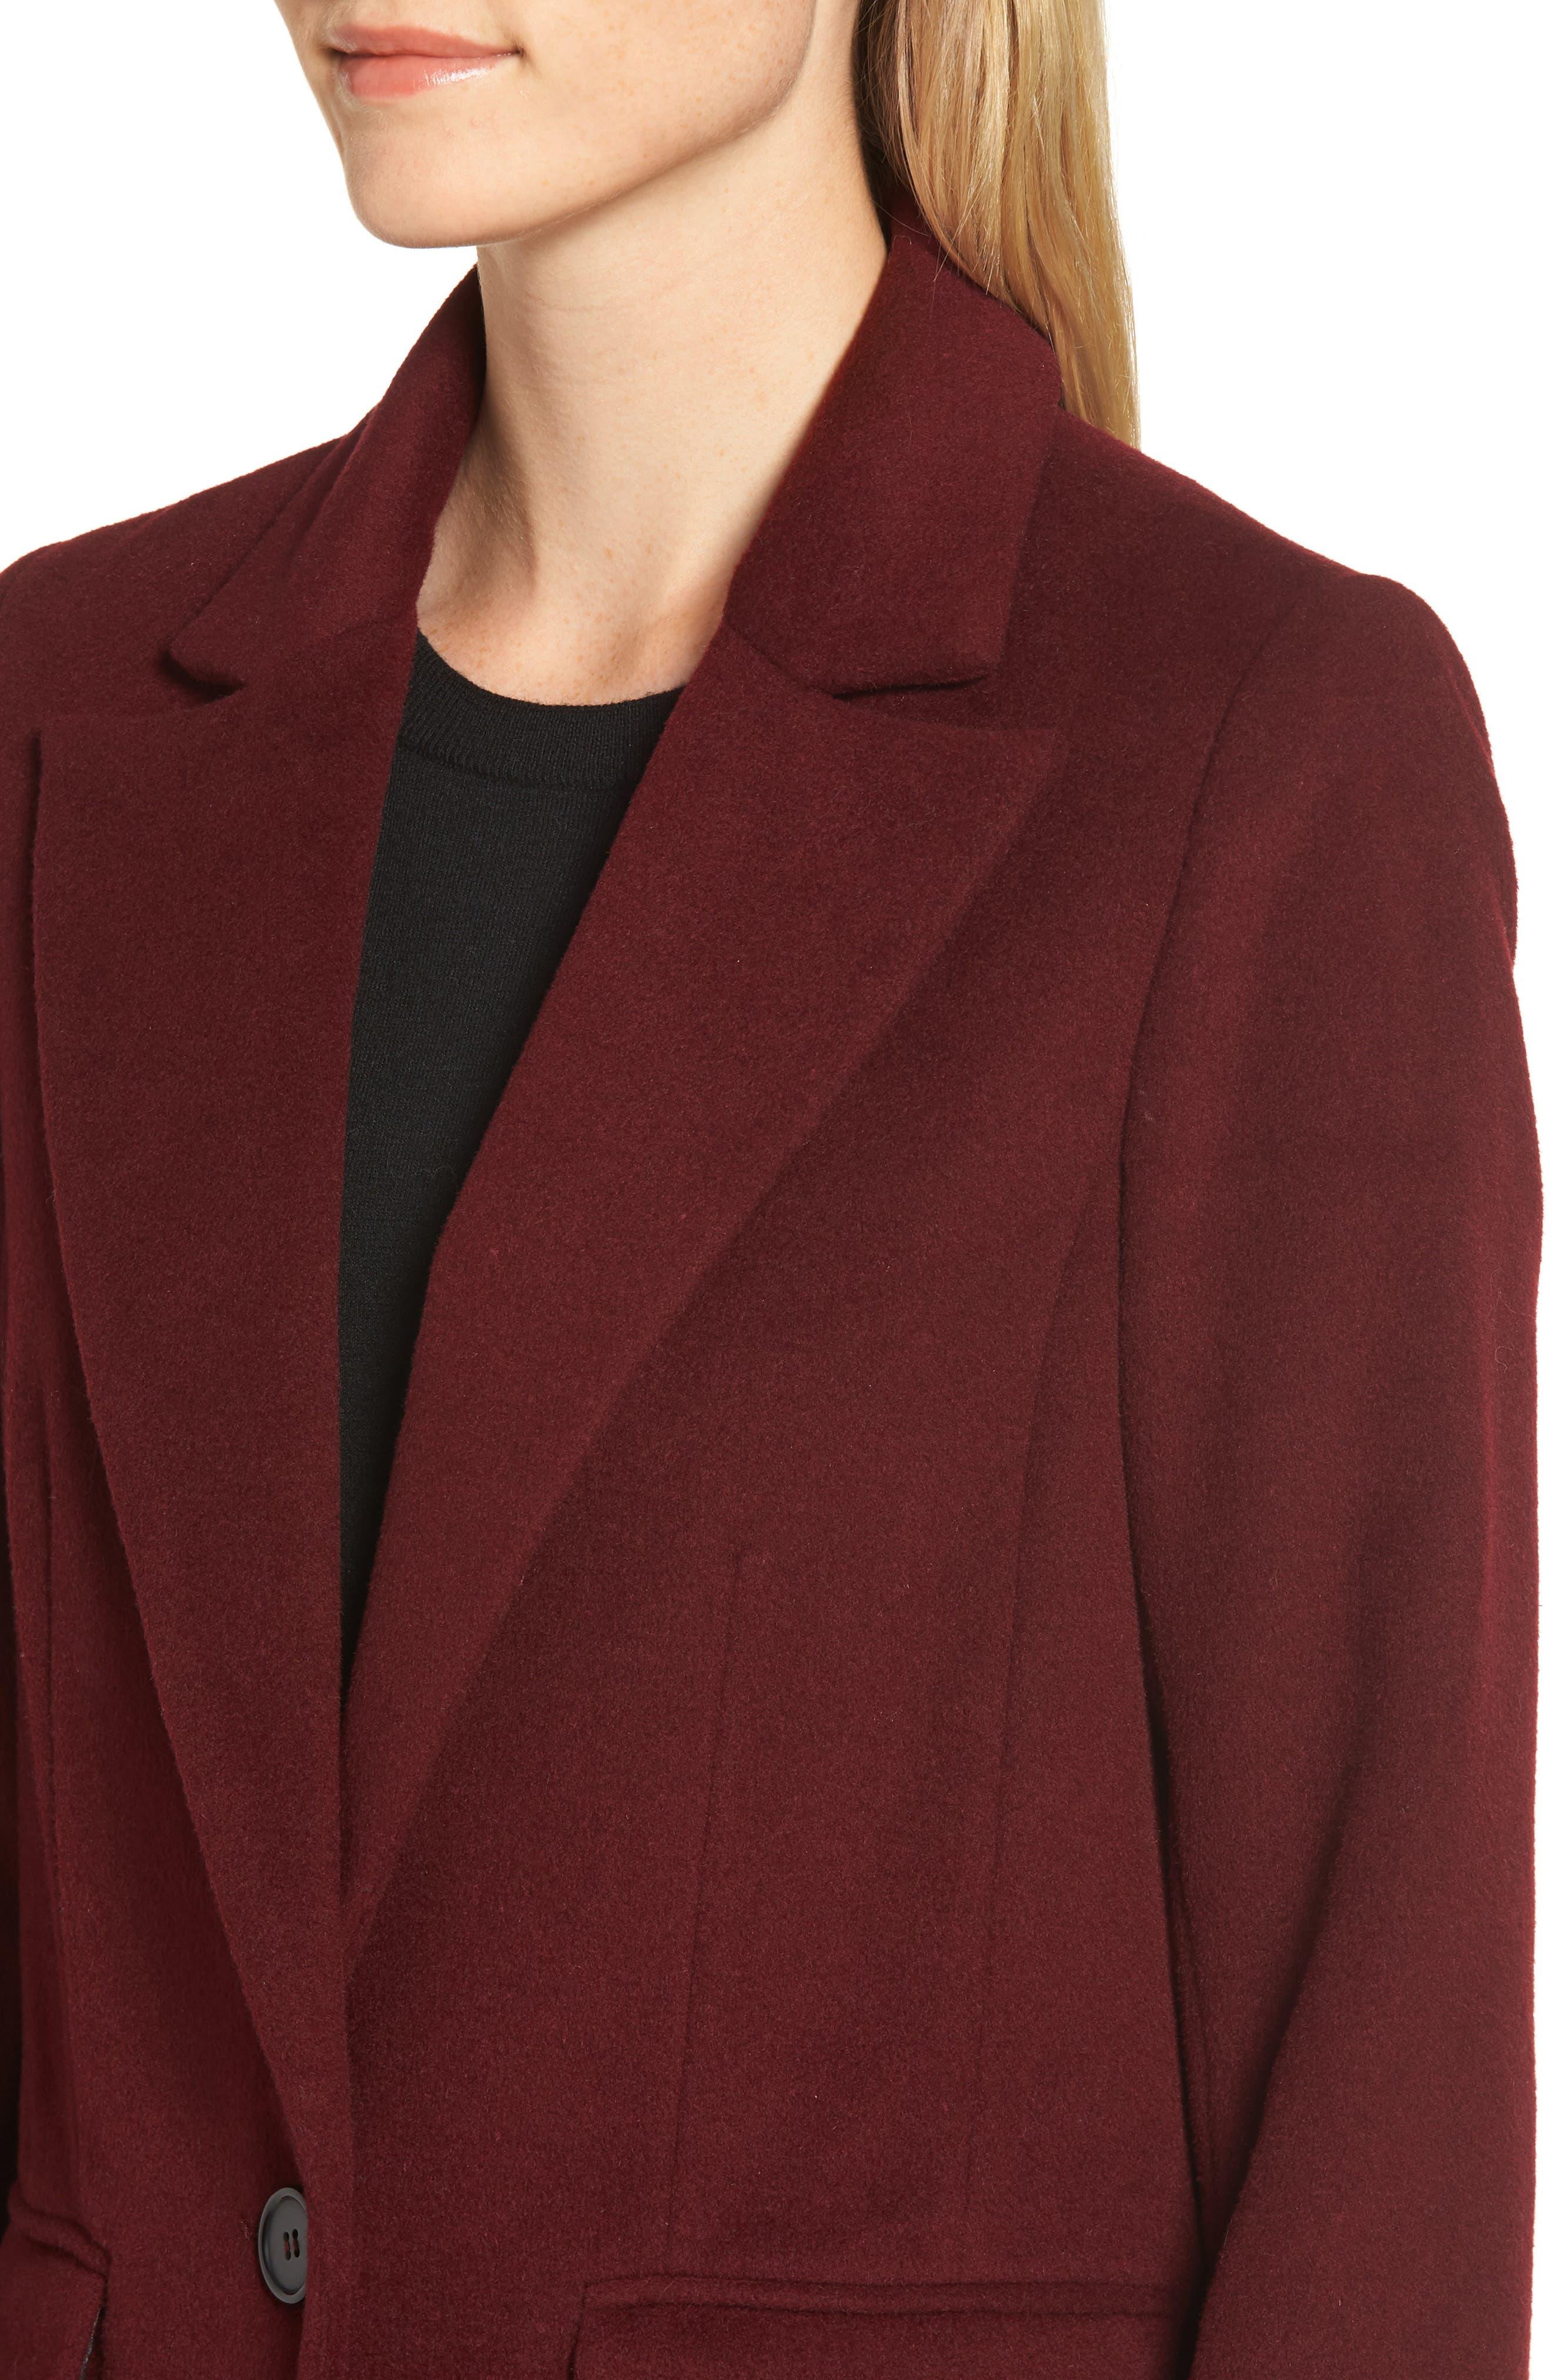 Wool Blend Menswear Coat,                             Alternate thumbnail 4, color,                             BURGUNDY